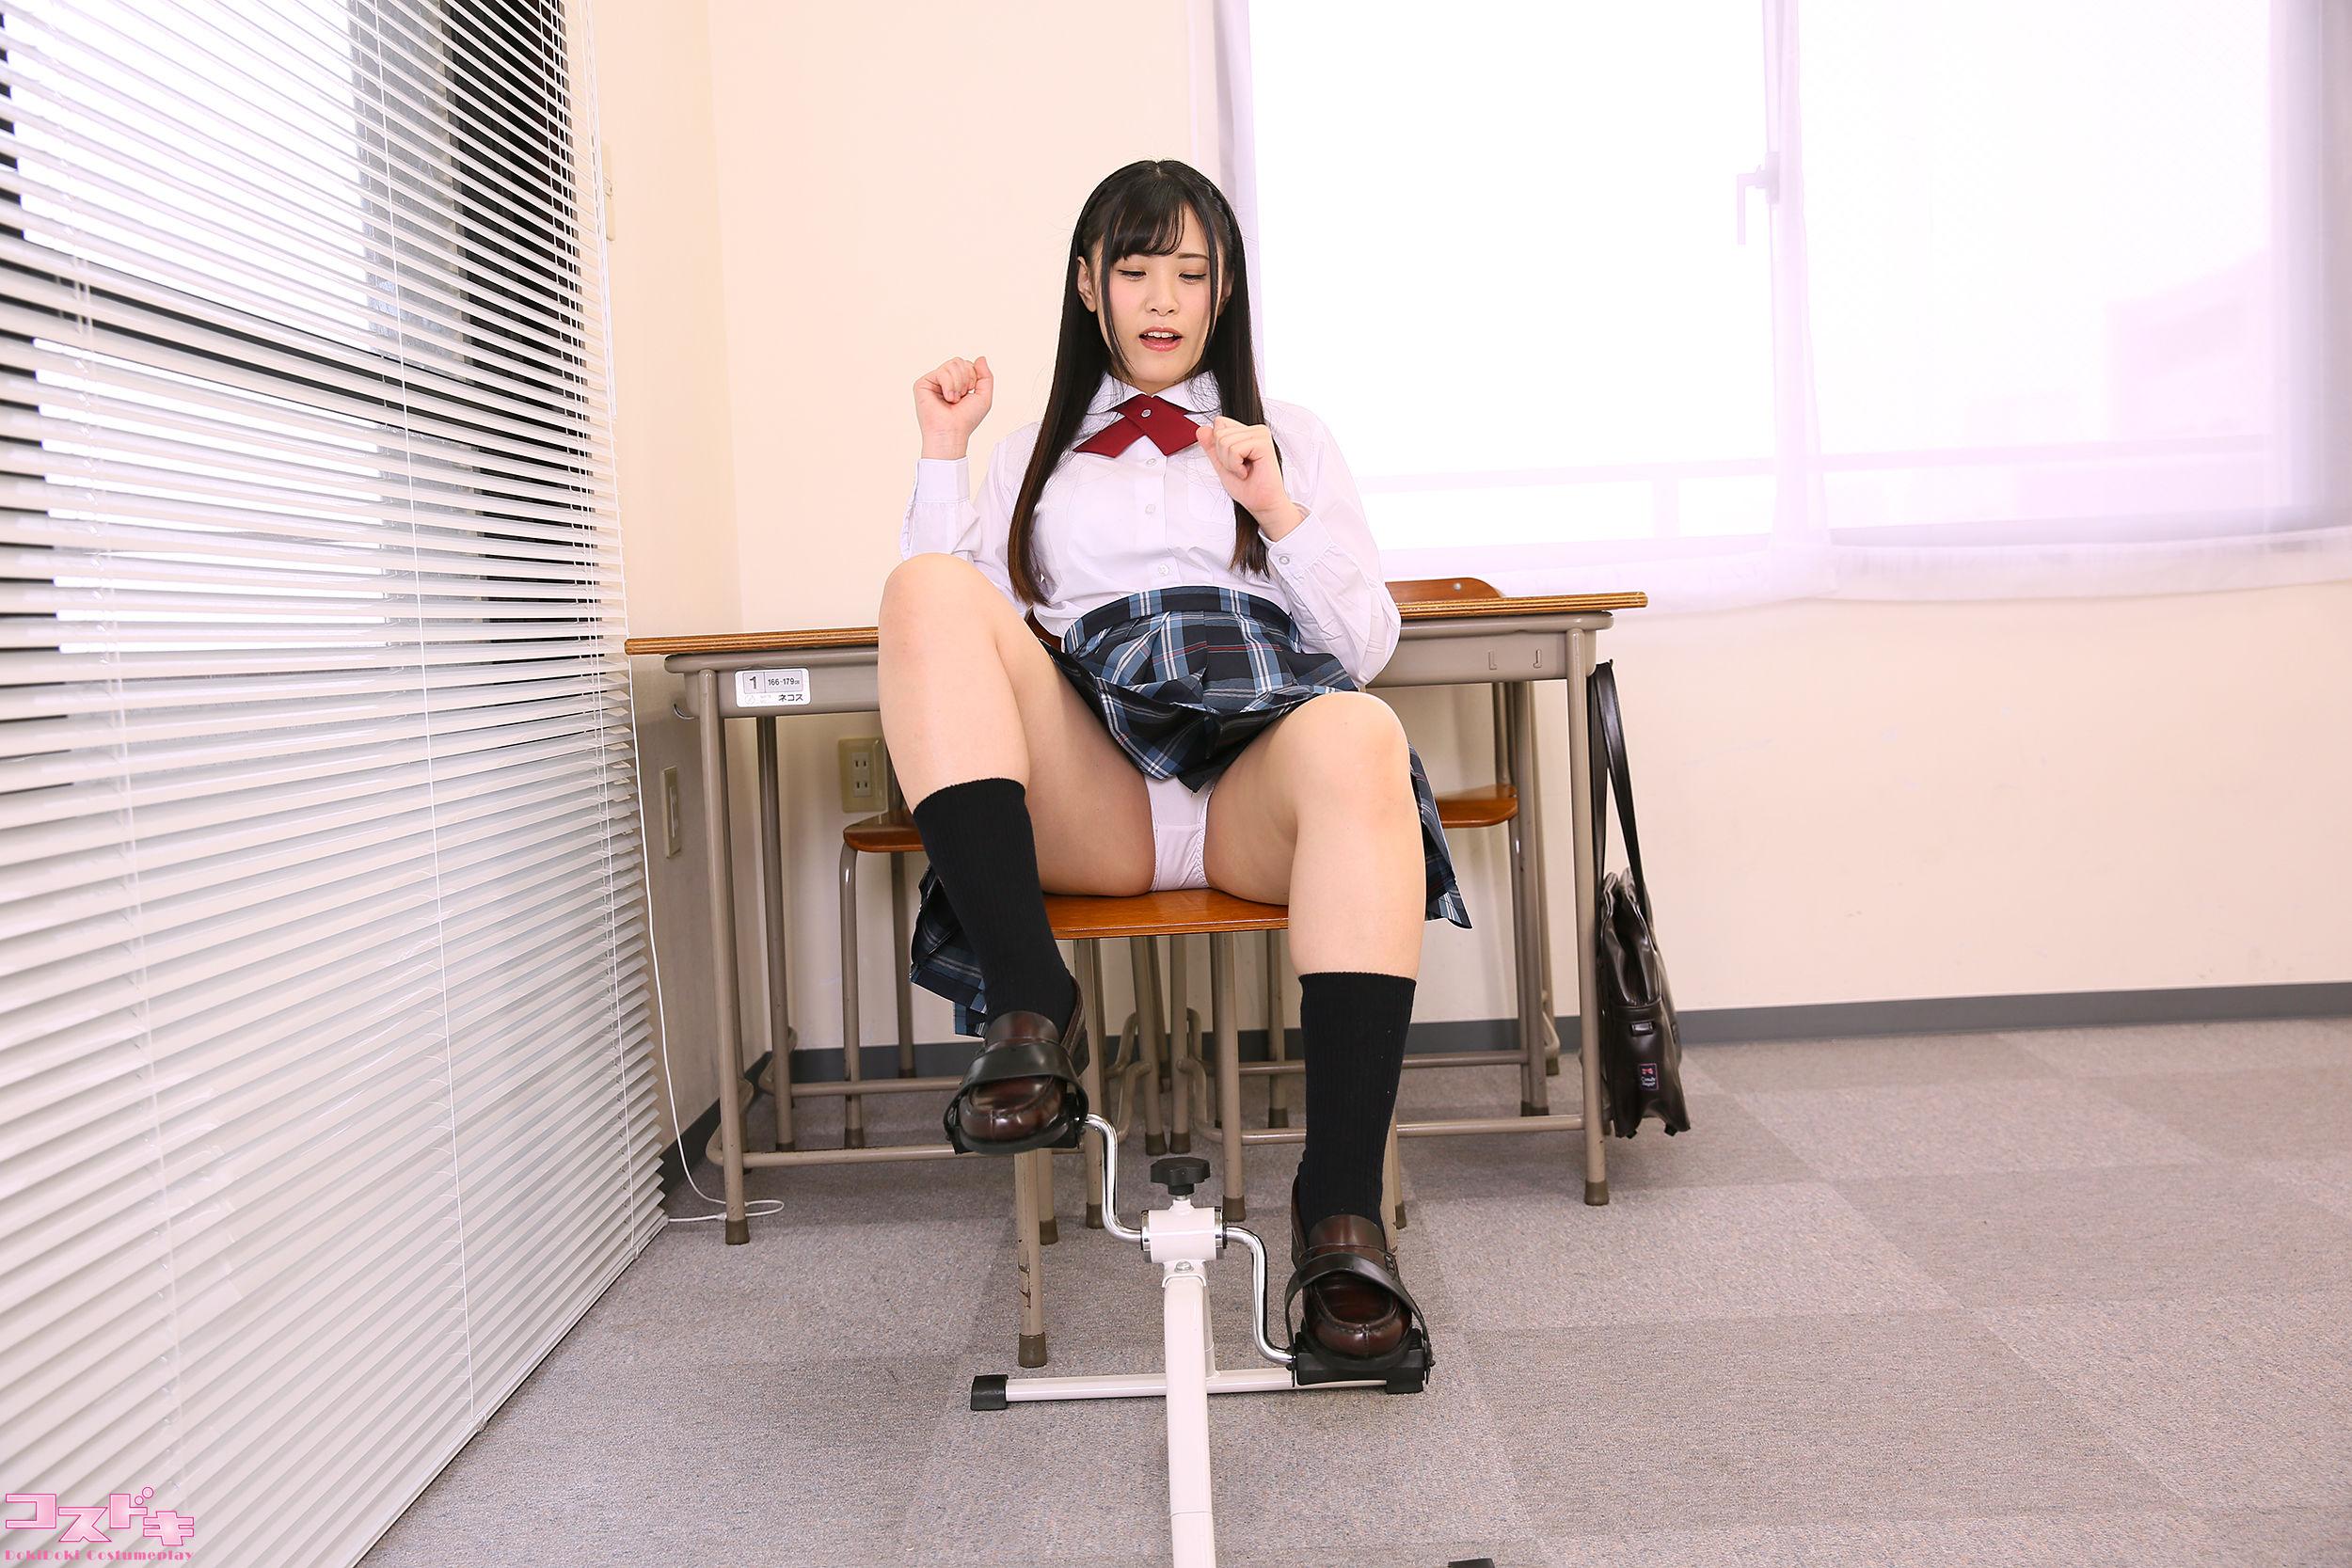 VOL.866 [Cosdoki]学生制服:涼城りおな超高清写真套图(44P)